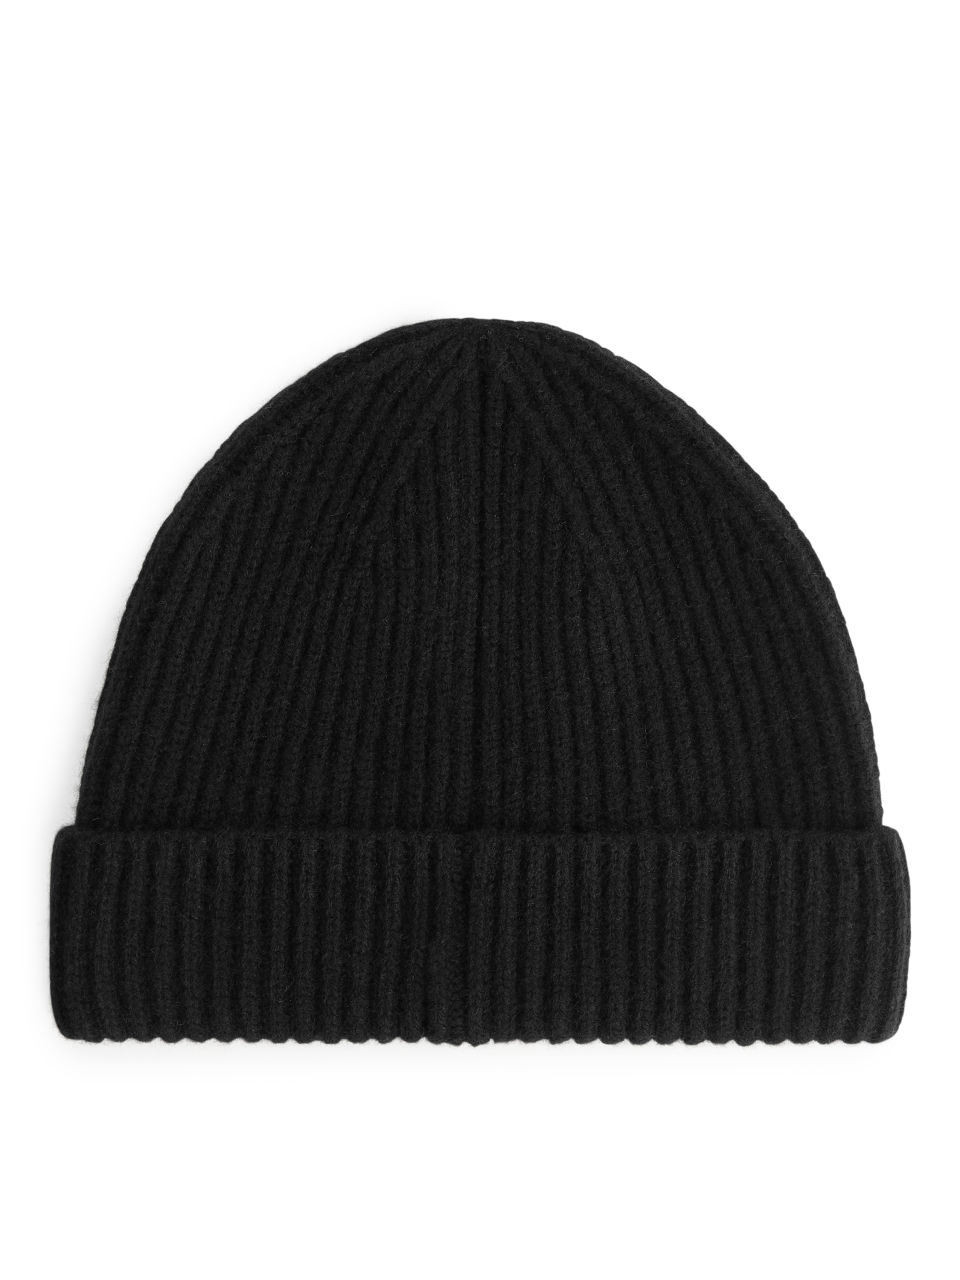 Cashmere Blend Beanie - Black